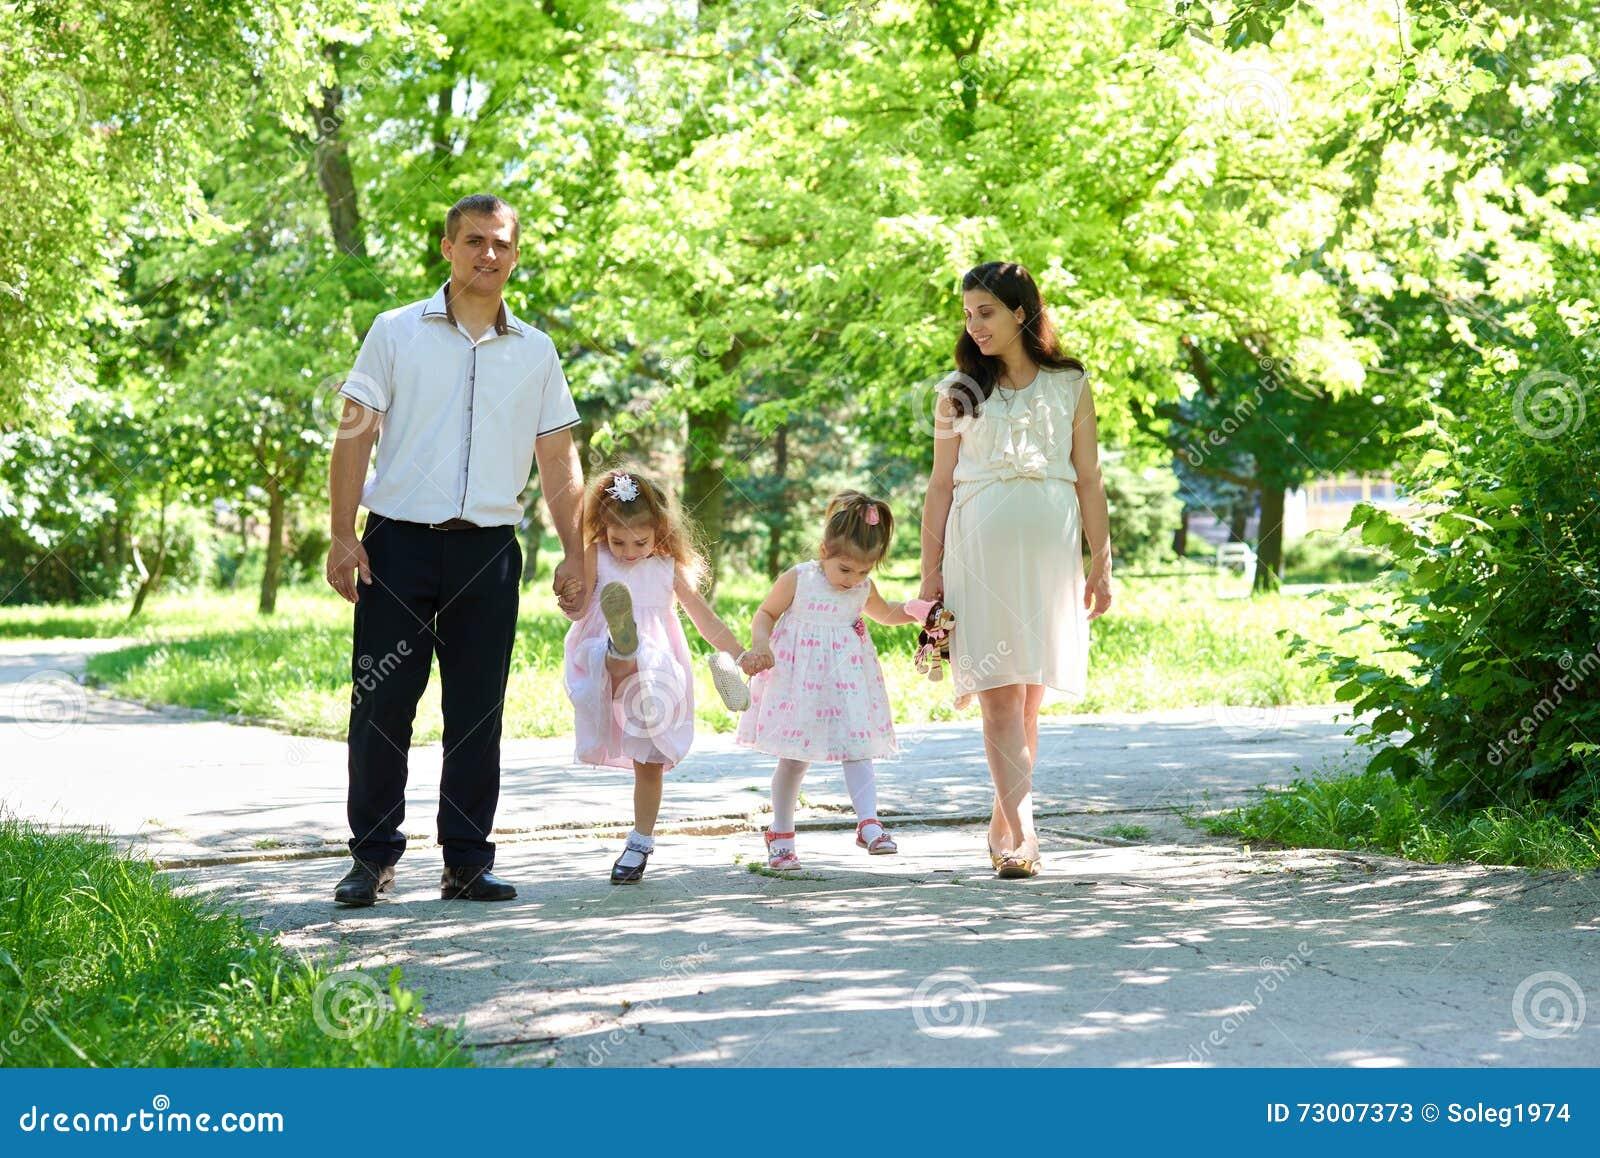 Family Walk In City Park. Stock Photo | CartoonDealer.com ...